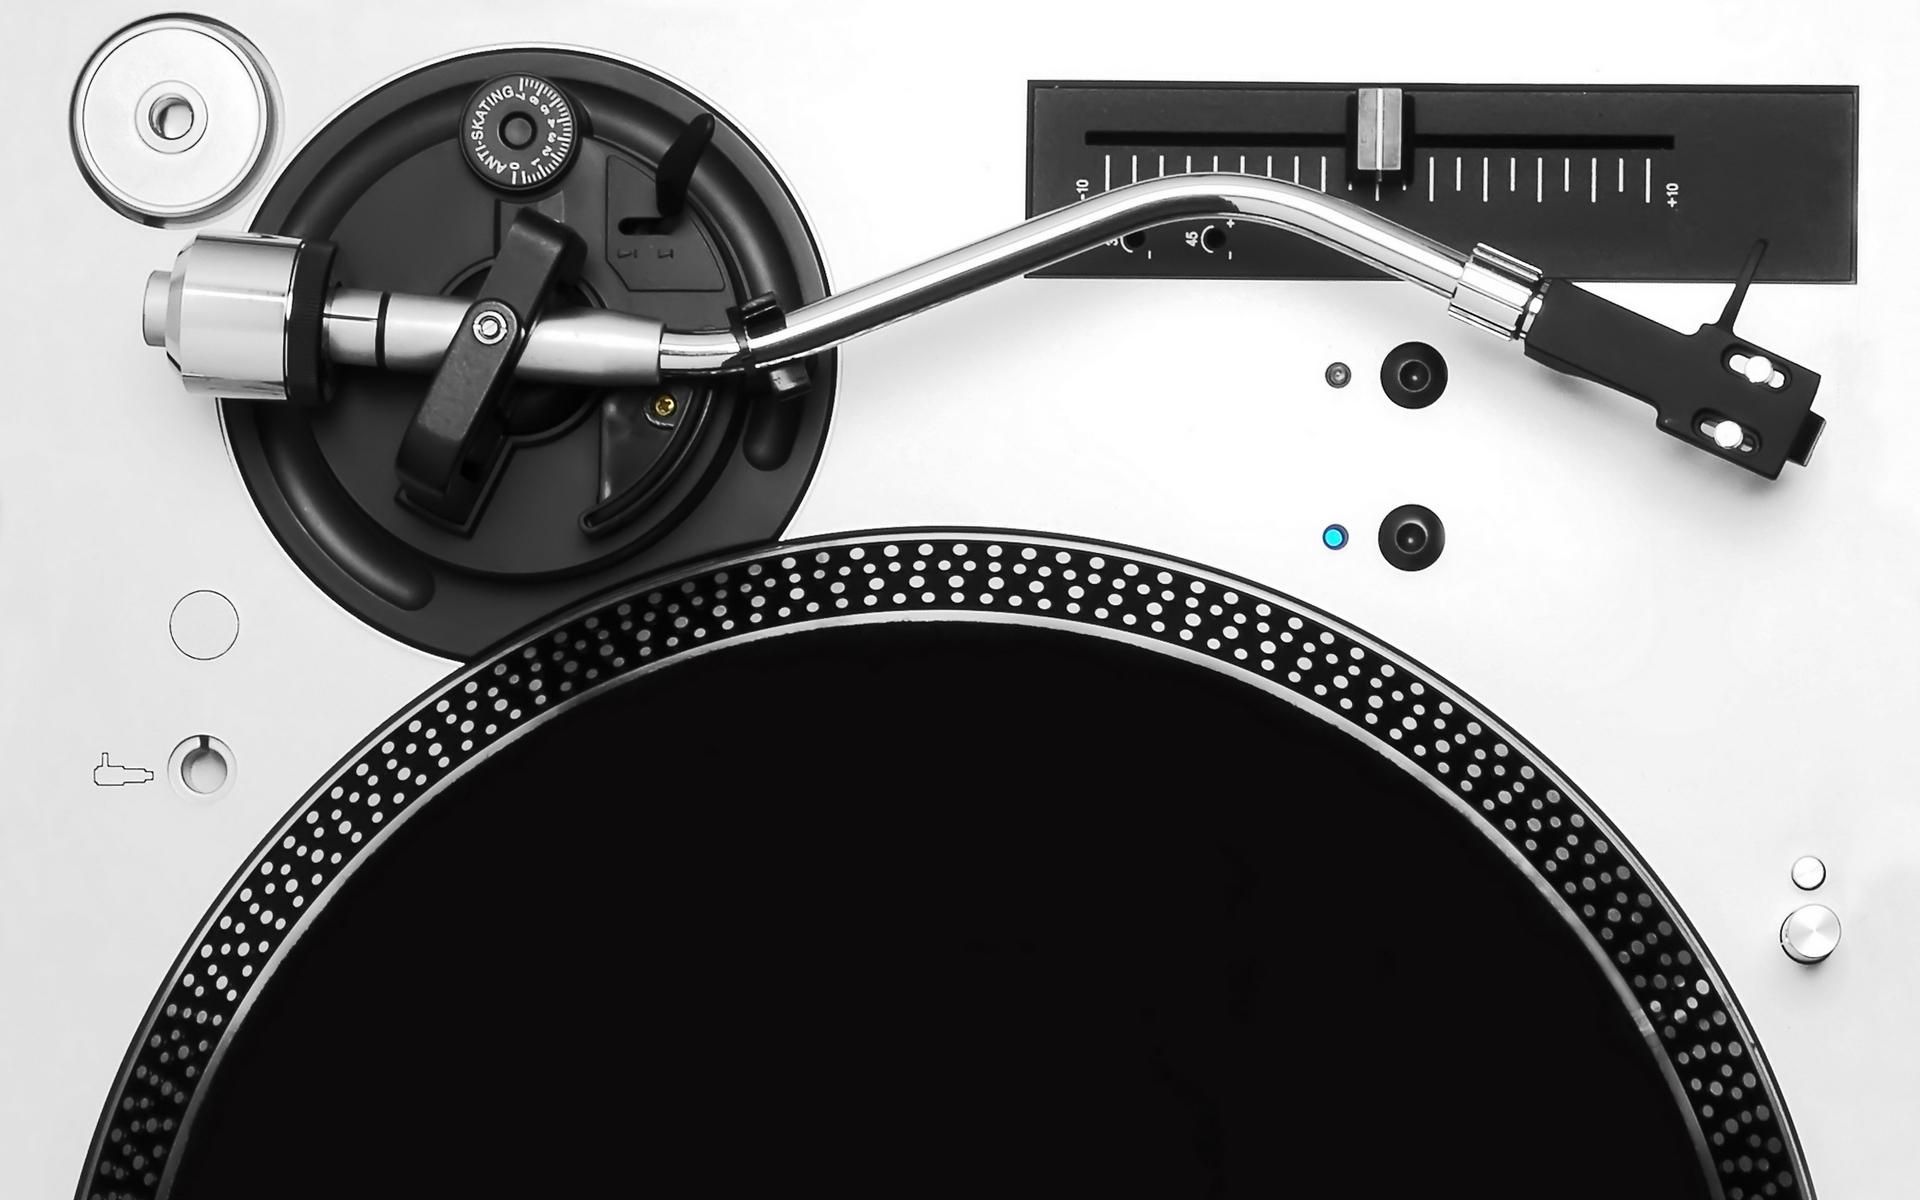 Black And White Wallpaper Music-8 | Dj's | Pinterest | Black and